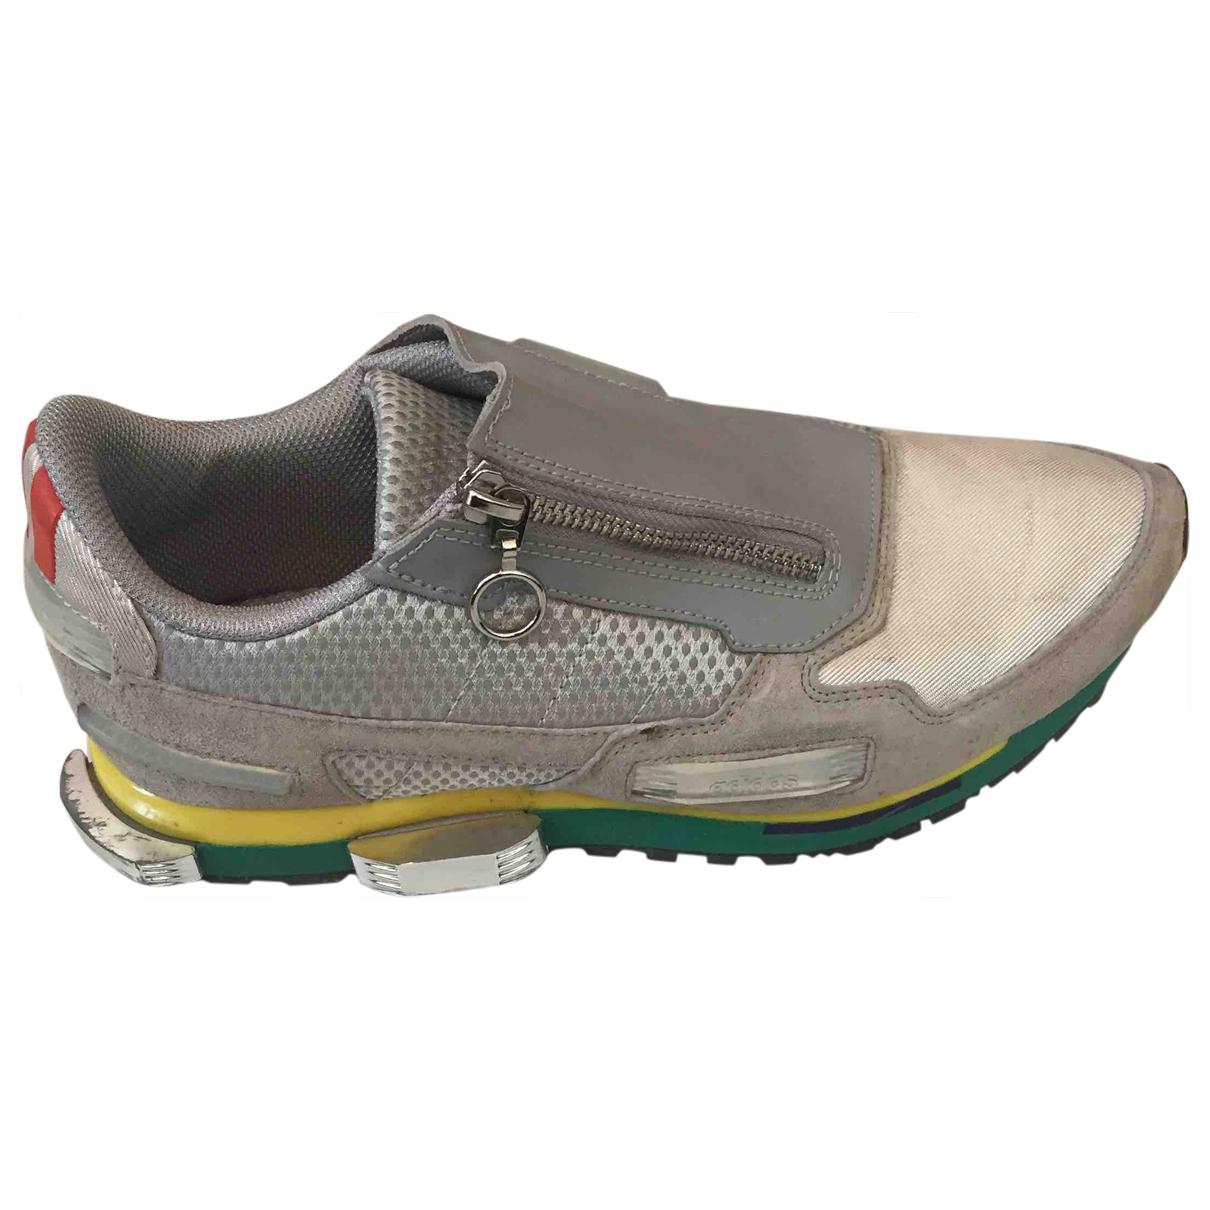 Adidas X Raf Simons \N Sneakers in  Grau Leinen